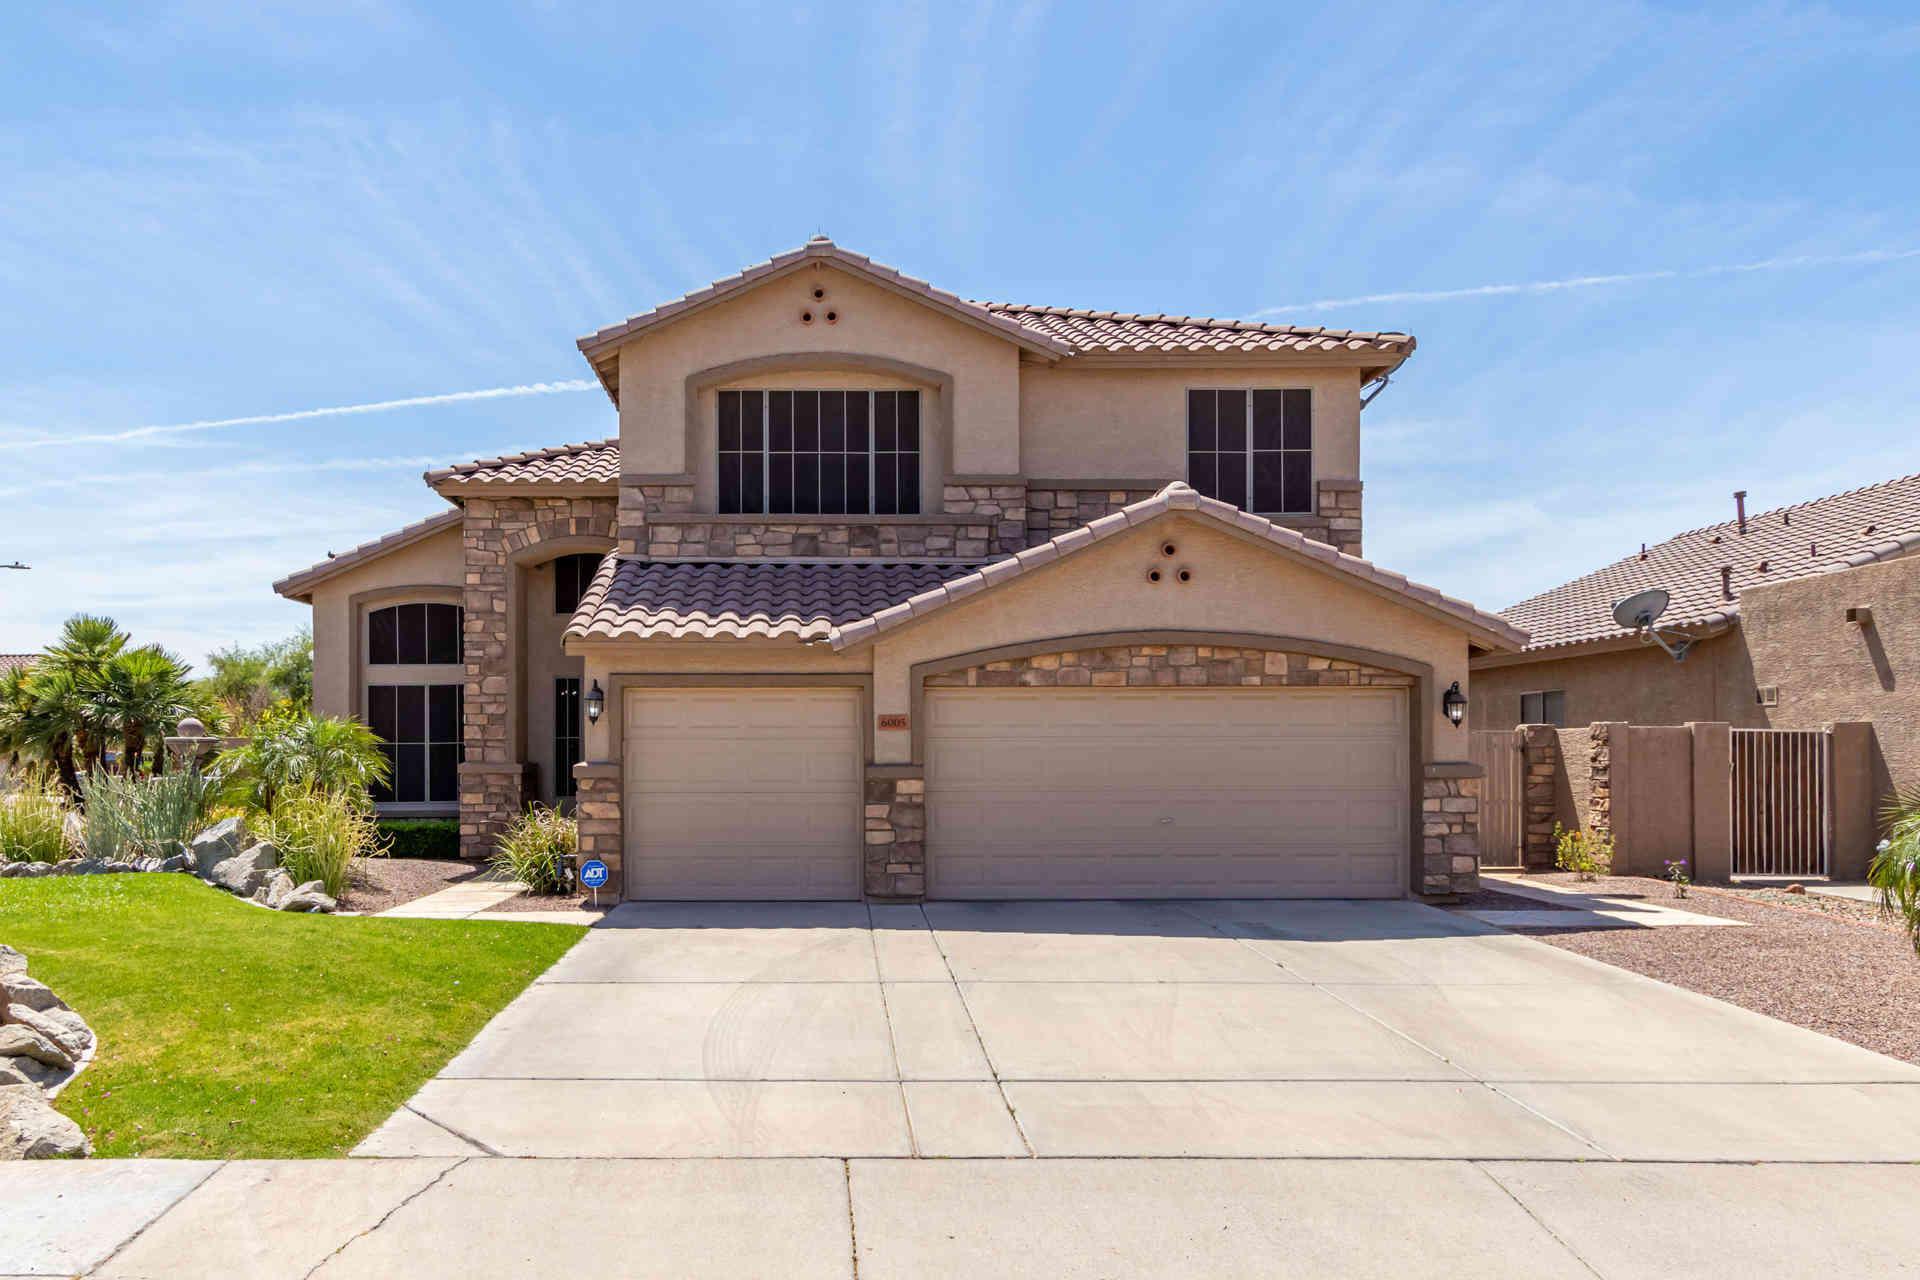 6005 W KIMBERLY Way, Glendale, AZ, 85308,